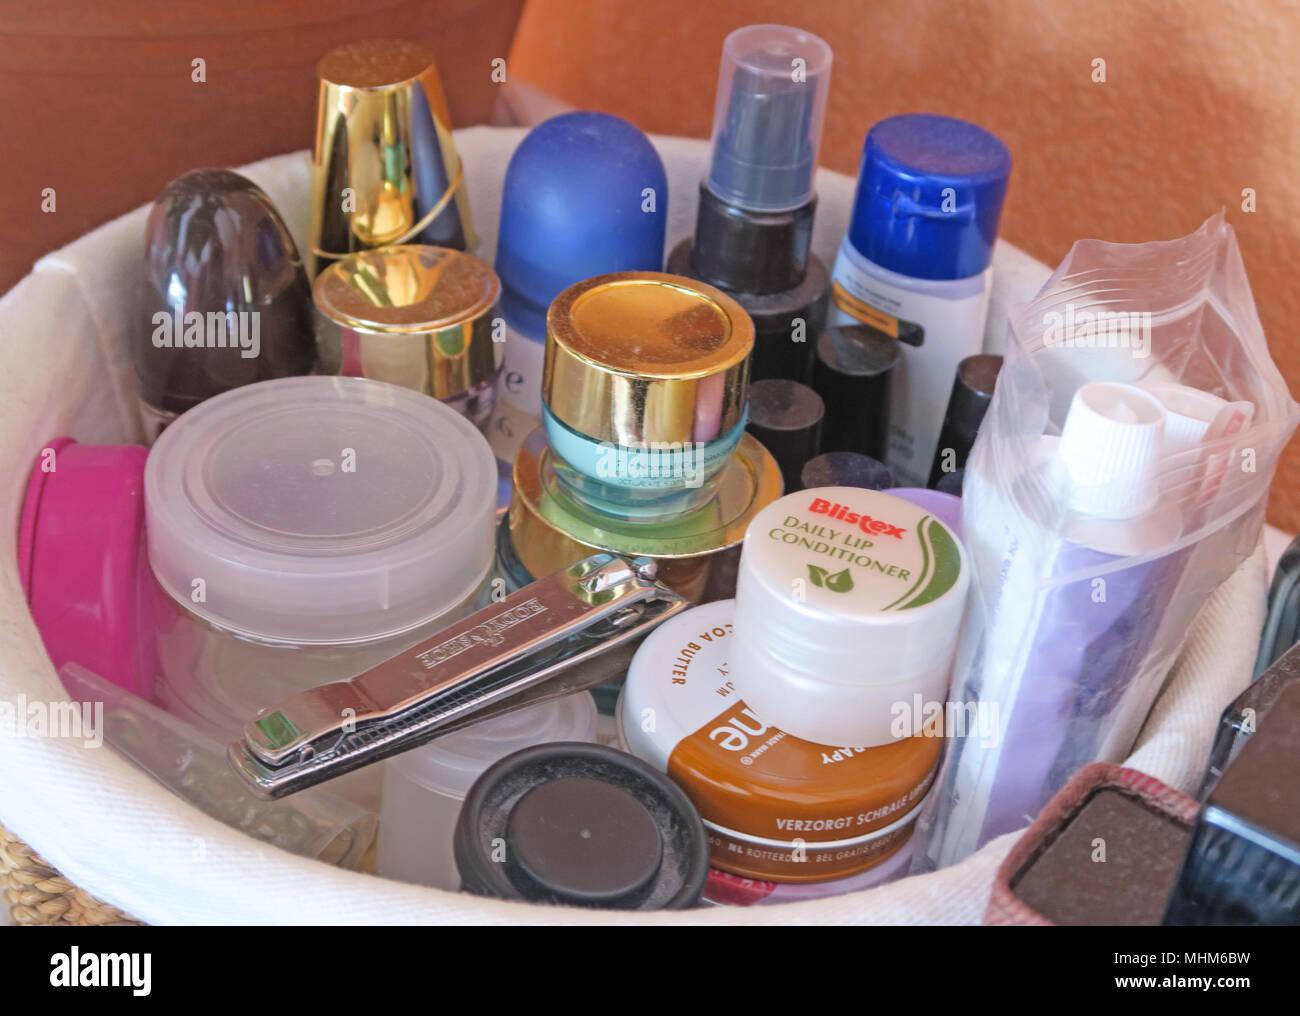 GoTonySmith,@HotpixUK,unilever,singleuse,cap,nozzle,rollon,roll-on,single,single-use,plastic,plastic